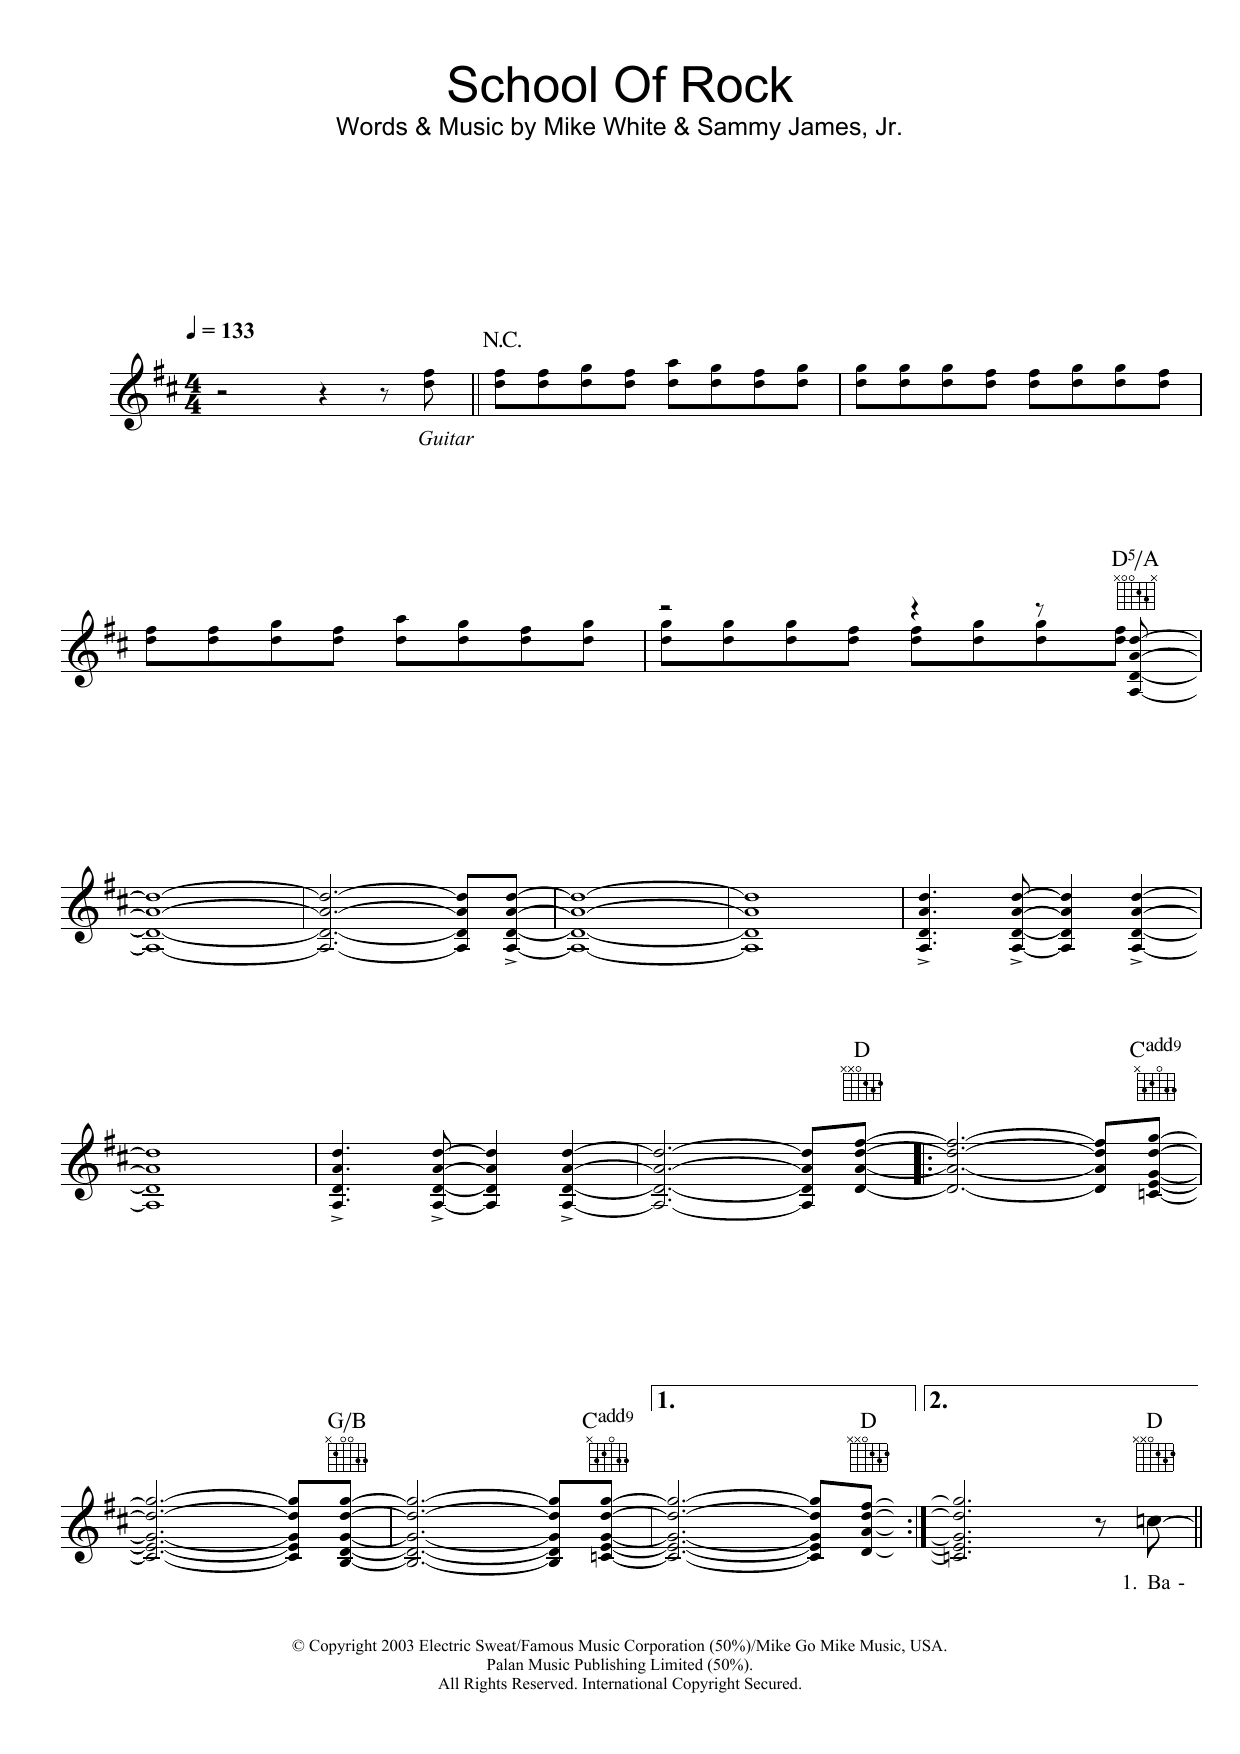 Sheet Music Digital Files To Print Licensed Jack Black Digital